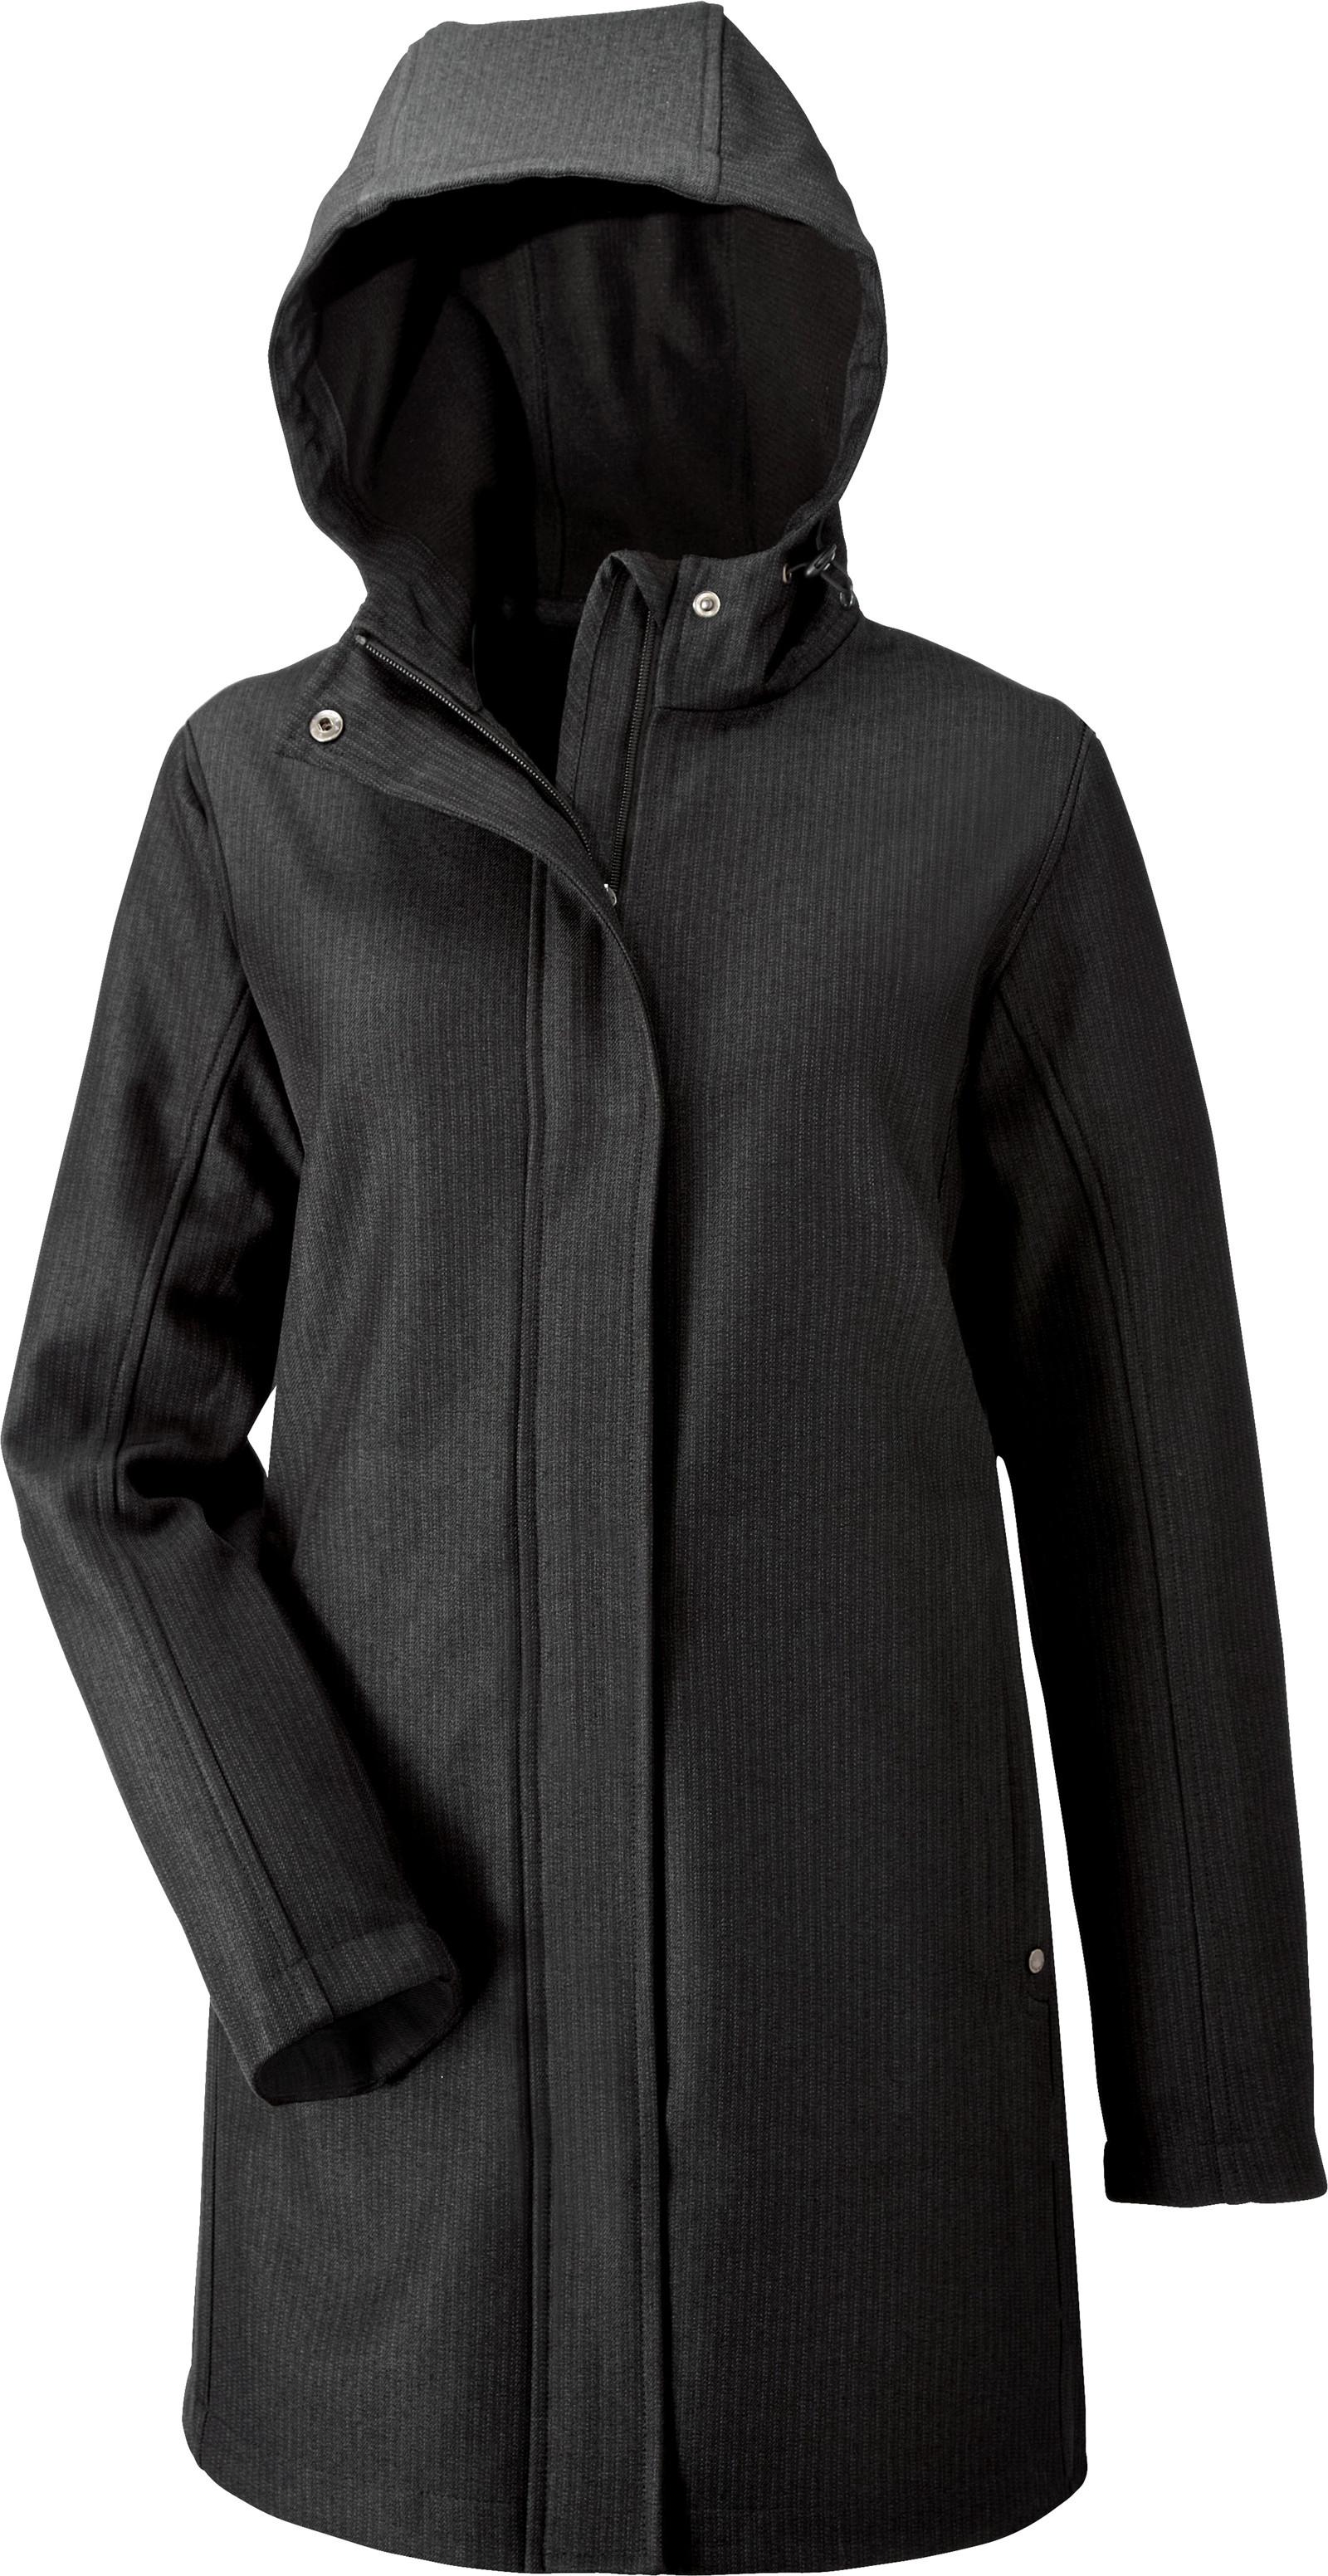 Ash City UTK 1 Warm.Logik 78171 - Ladies' Textured City Soft Shell Jacket